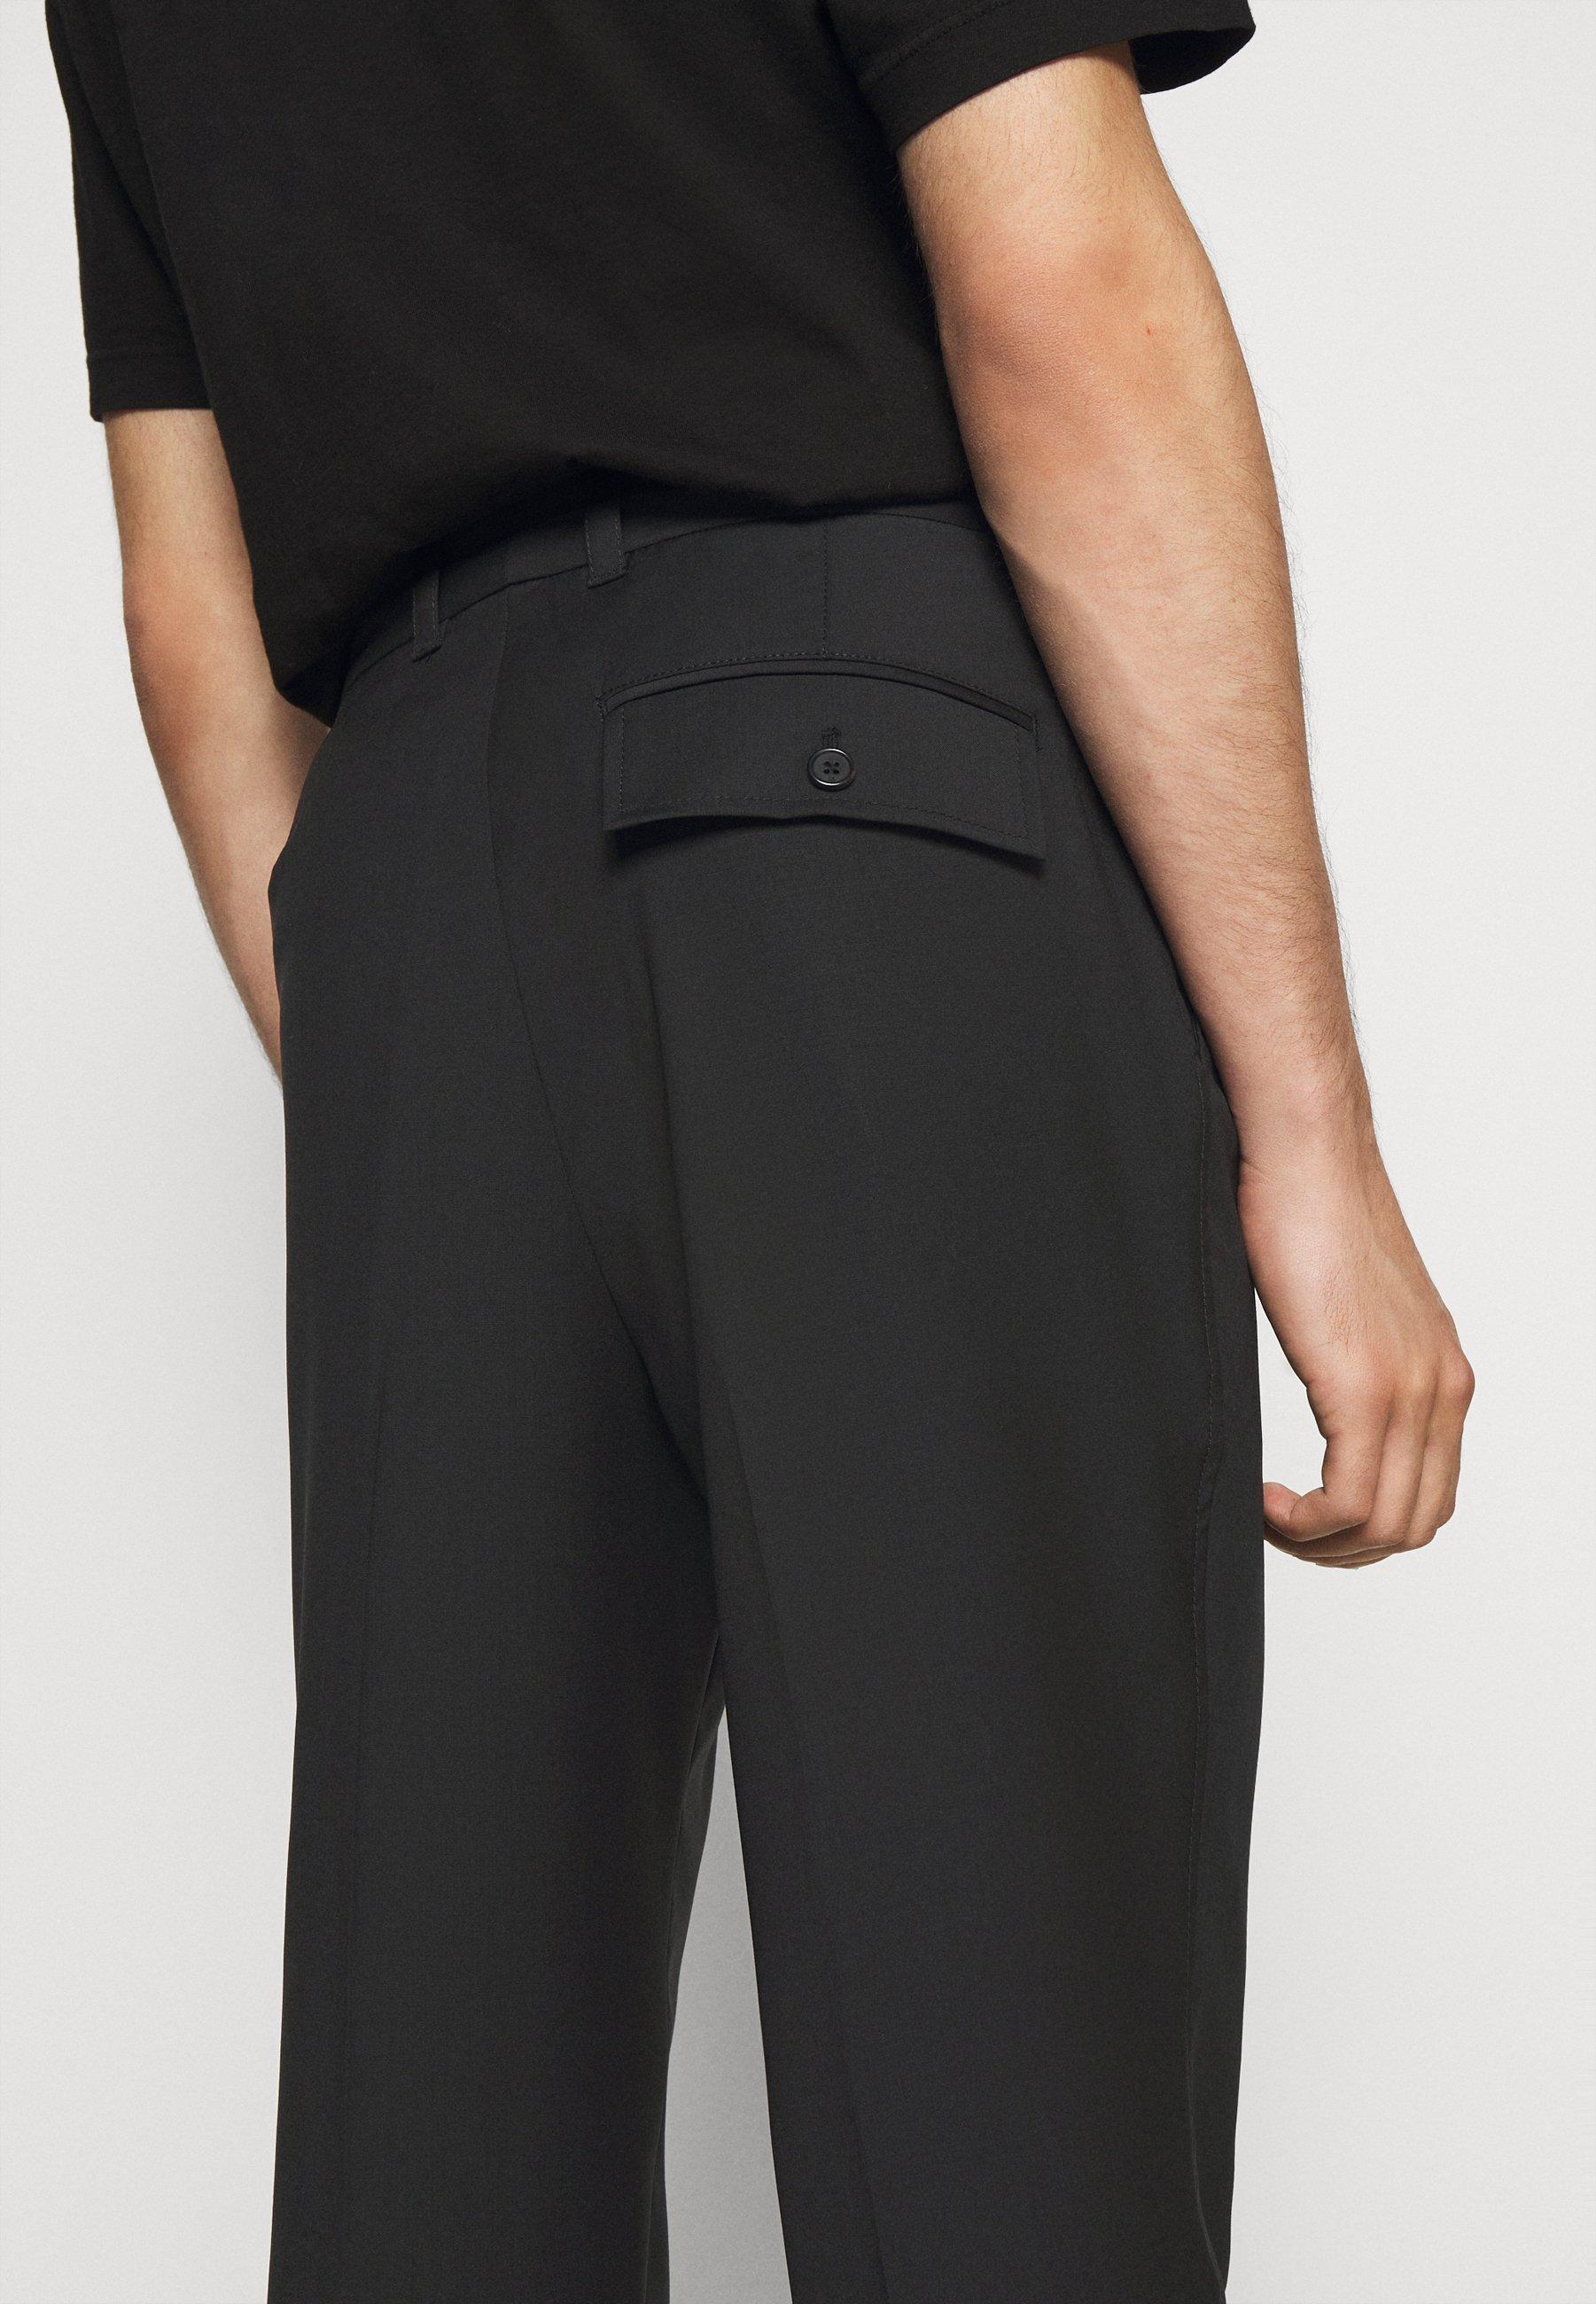 3.1 Phillip Lim Single Pleat - Spodnie Materiałowe Black